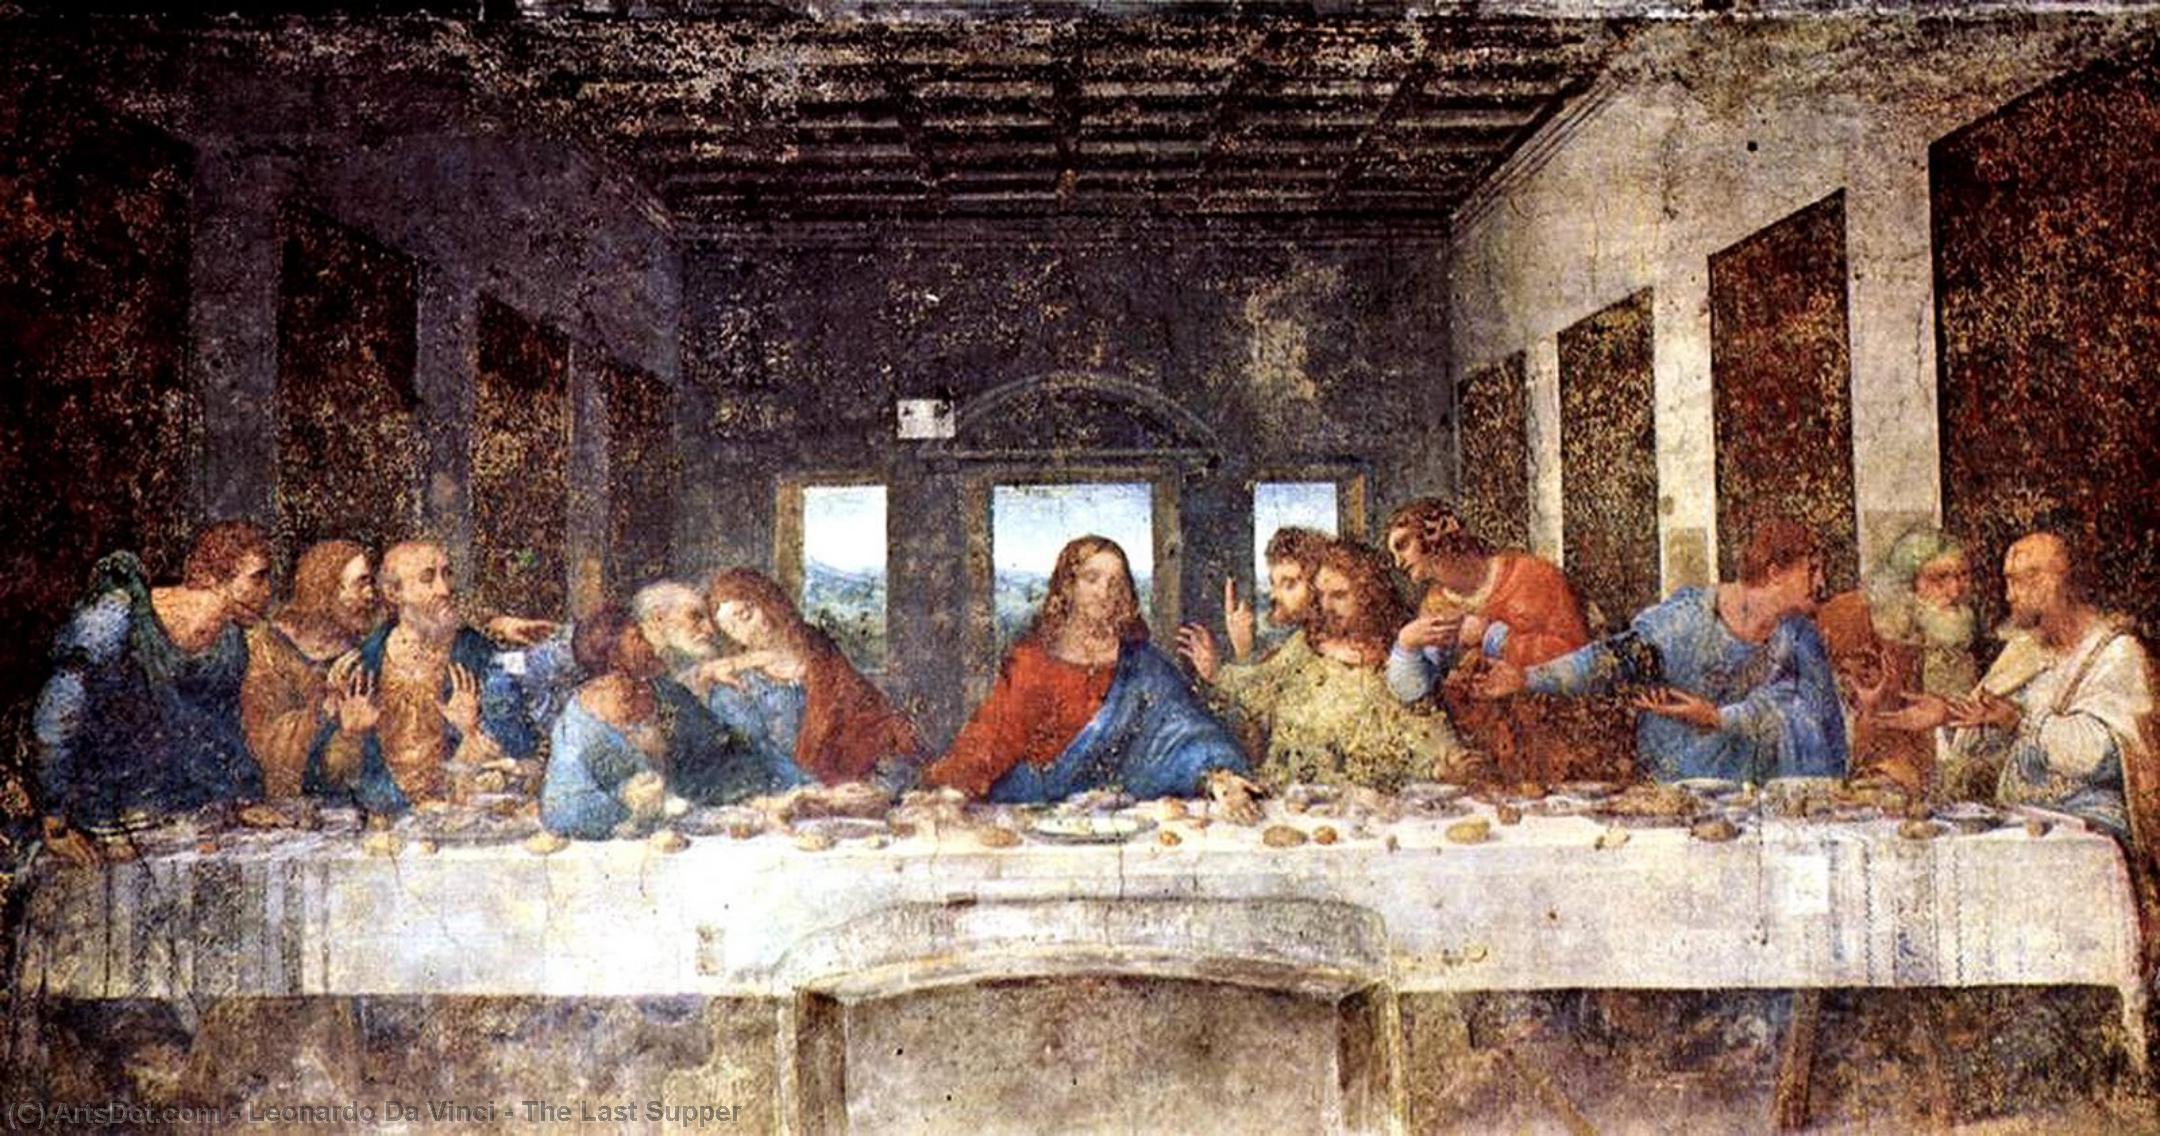 WikiOO.org - Güzel Sanatlar Ansiklopedisi - Resim, Resimler Leonardo Da Vinci - The Last Supper